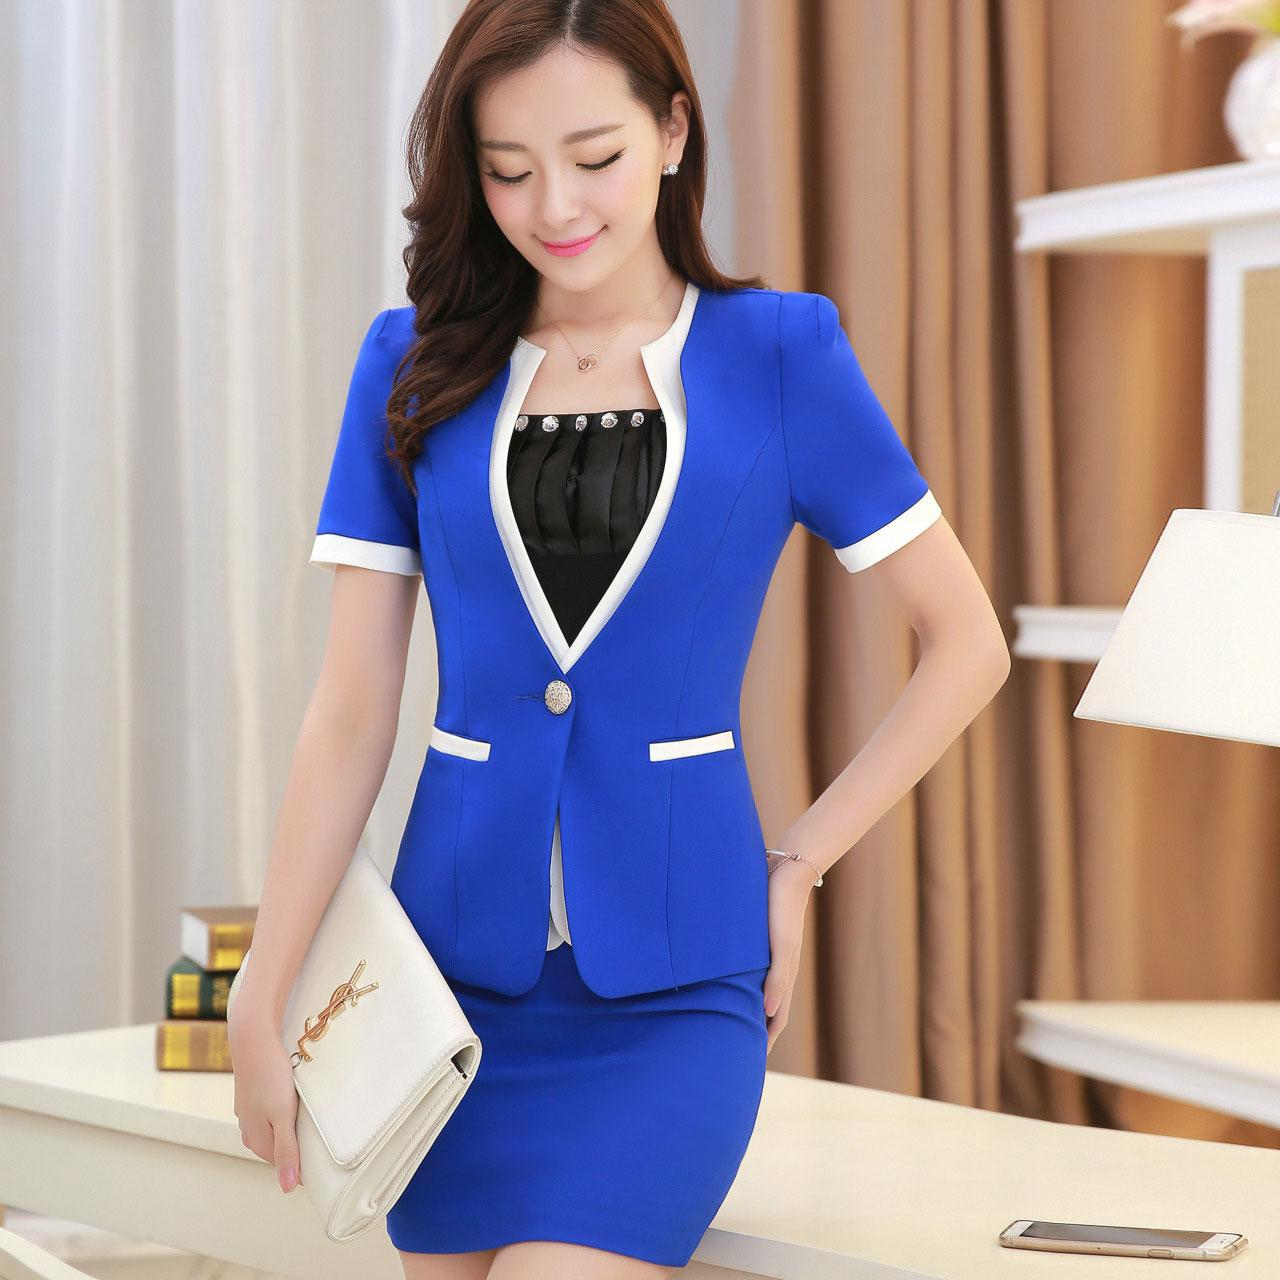 hot-sale-summer-style-women-business-suits.jpg